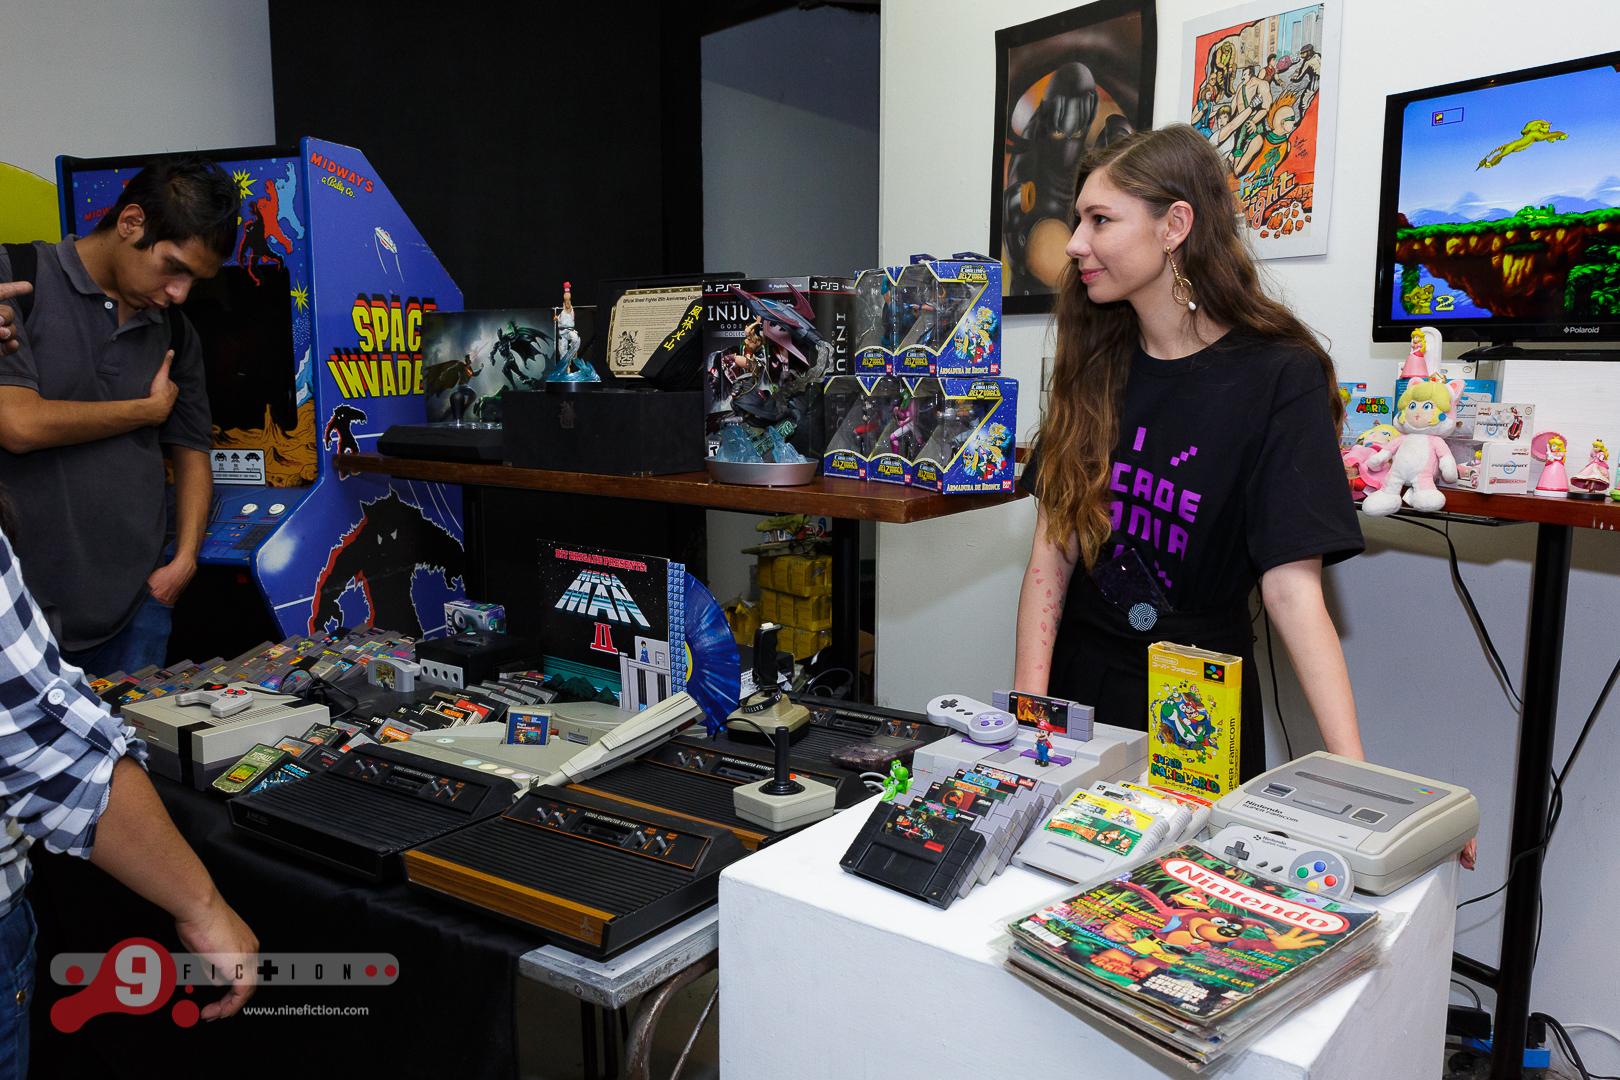 arcademania-2019-nine-fiction-photomonroy-9